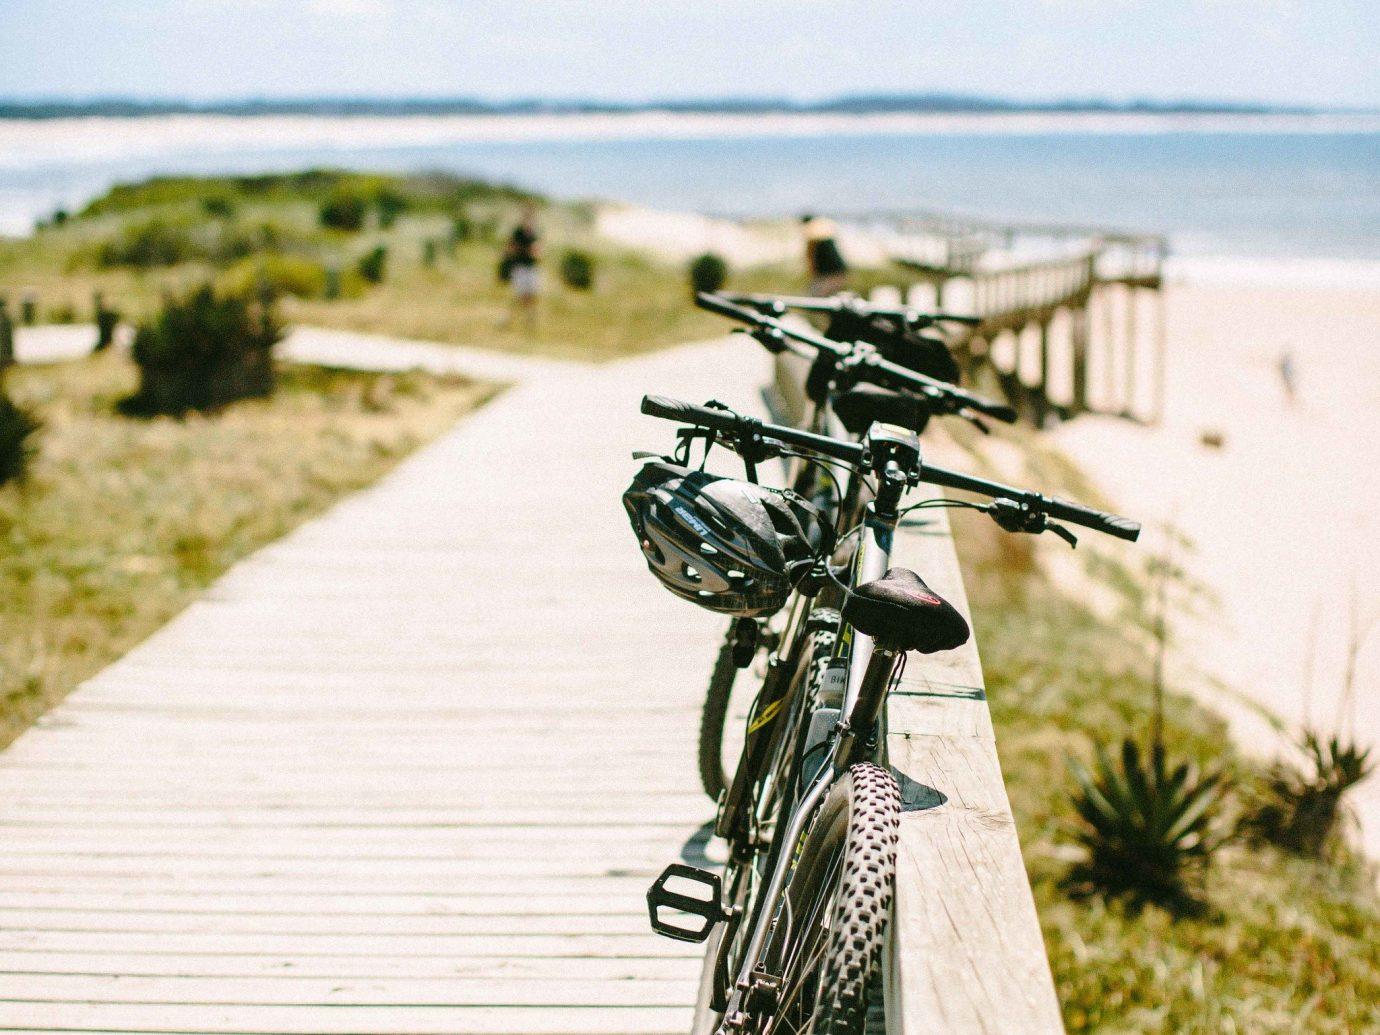 Beach Romantic Getaways south america Trip Ideas Uruguay road bicycle bicycle sky tree path grass Sea vacation boardwalk plant cycling hybrid bicycle cloud recreation